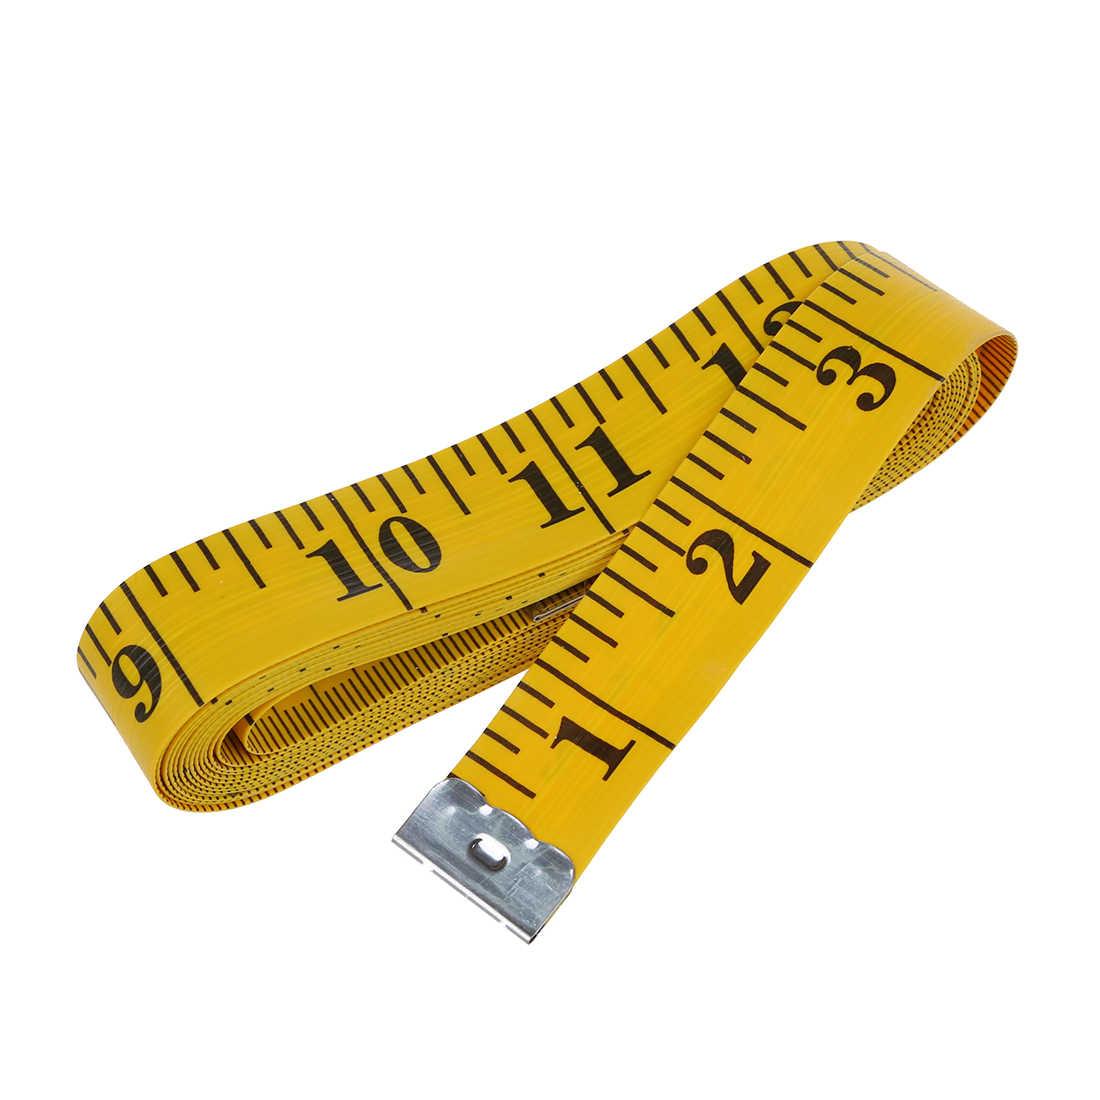 9A04 Schneider  3M Für  Maßband  120 /'/'  Lineal Körper Flexibel Präzision